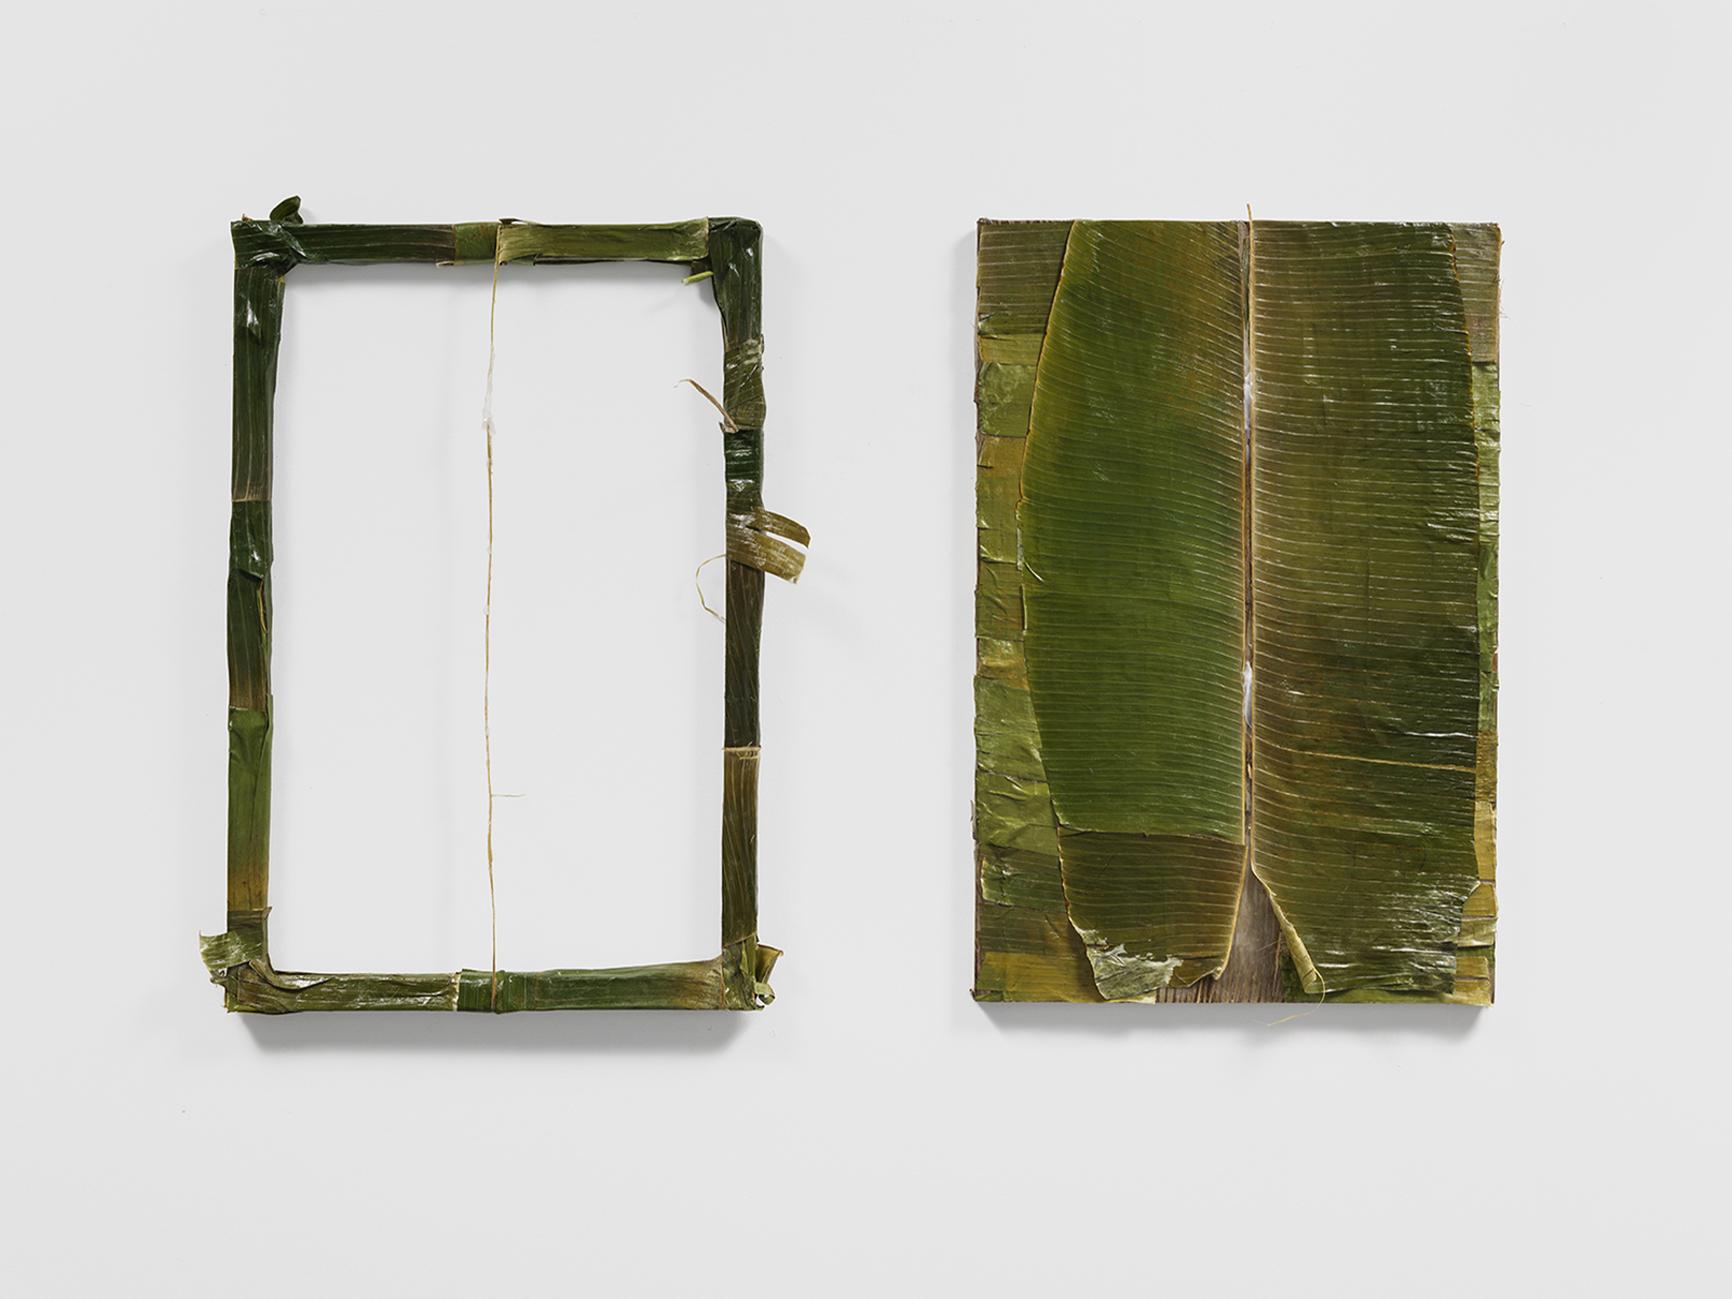 """Colgão Diptych""  petrolatum (Vicks VapoRub) on plantain leaves lined with resin,  36 x 24 in.each  2017"